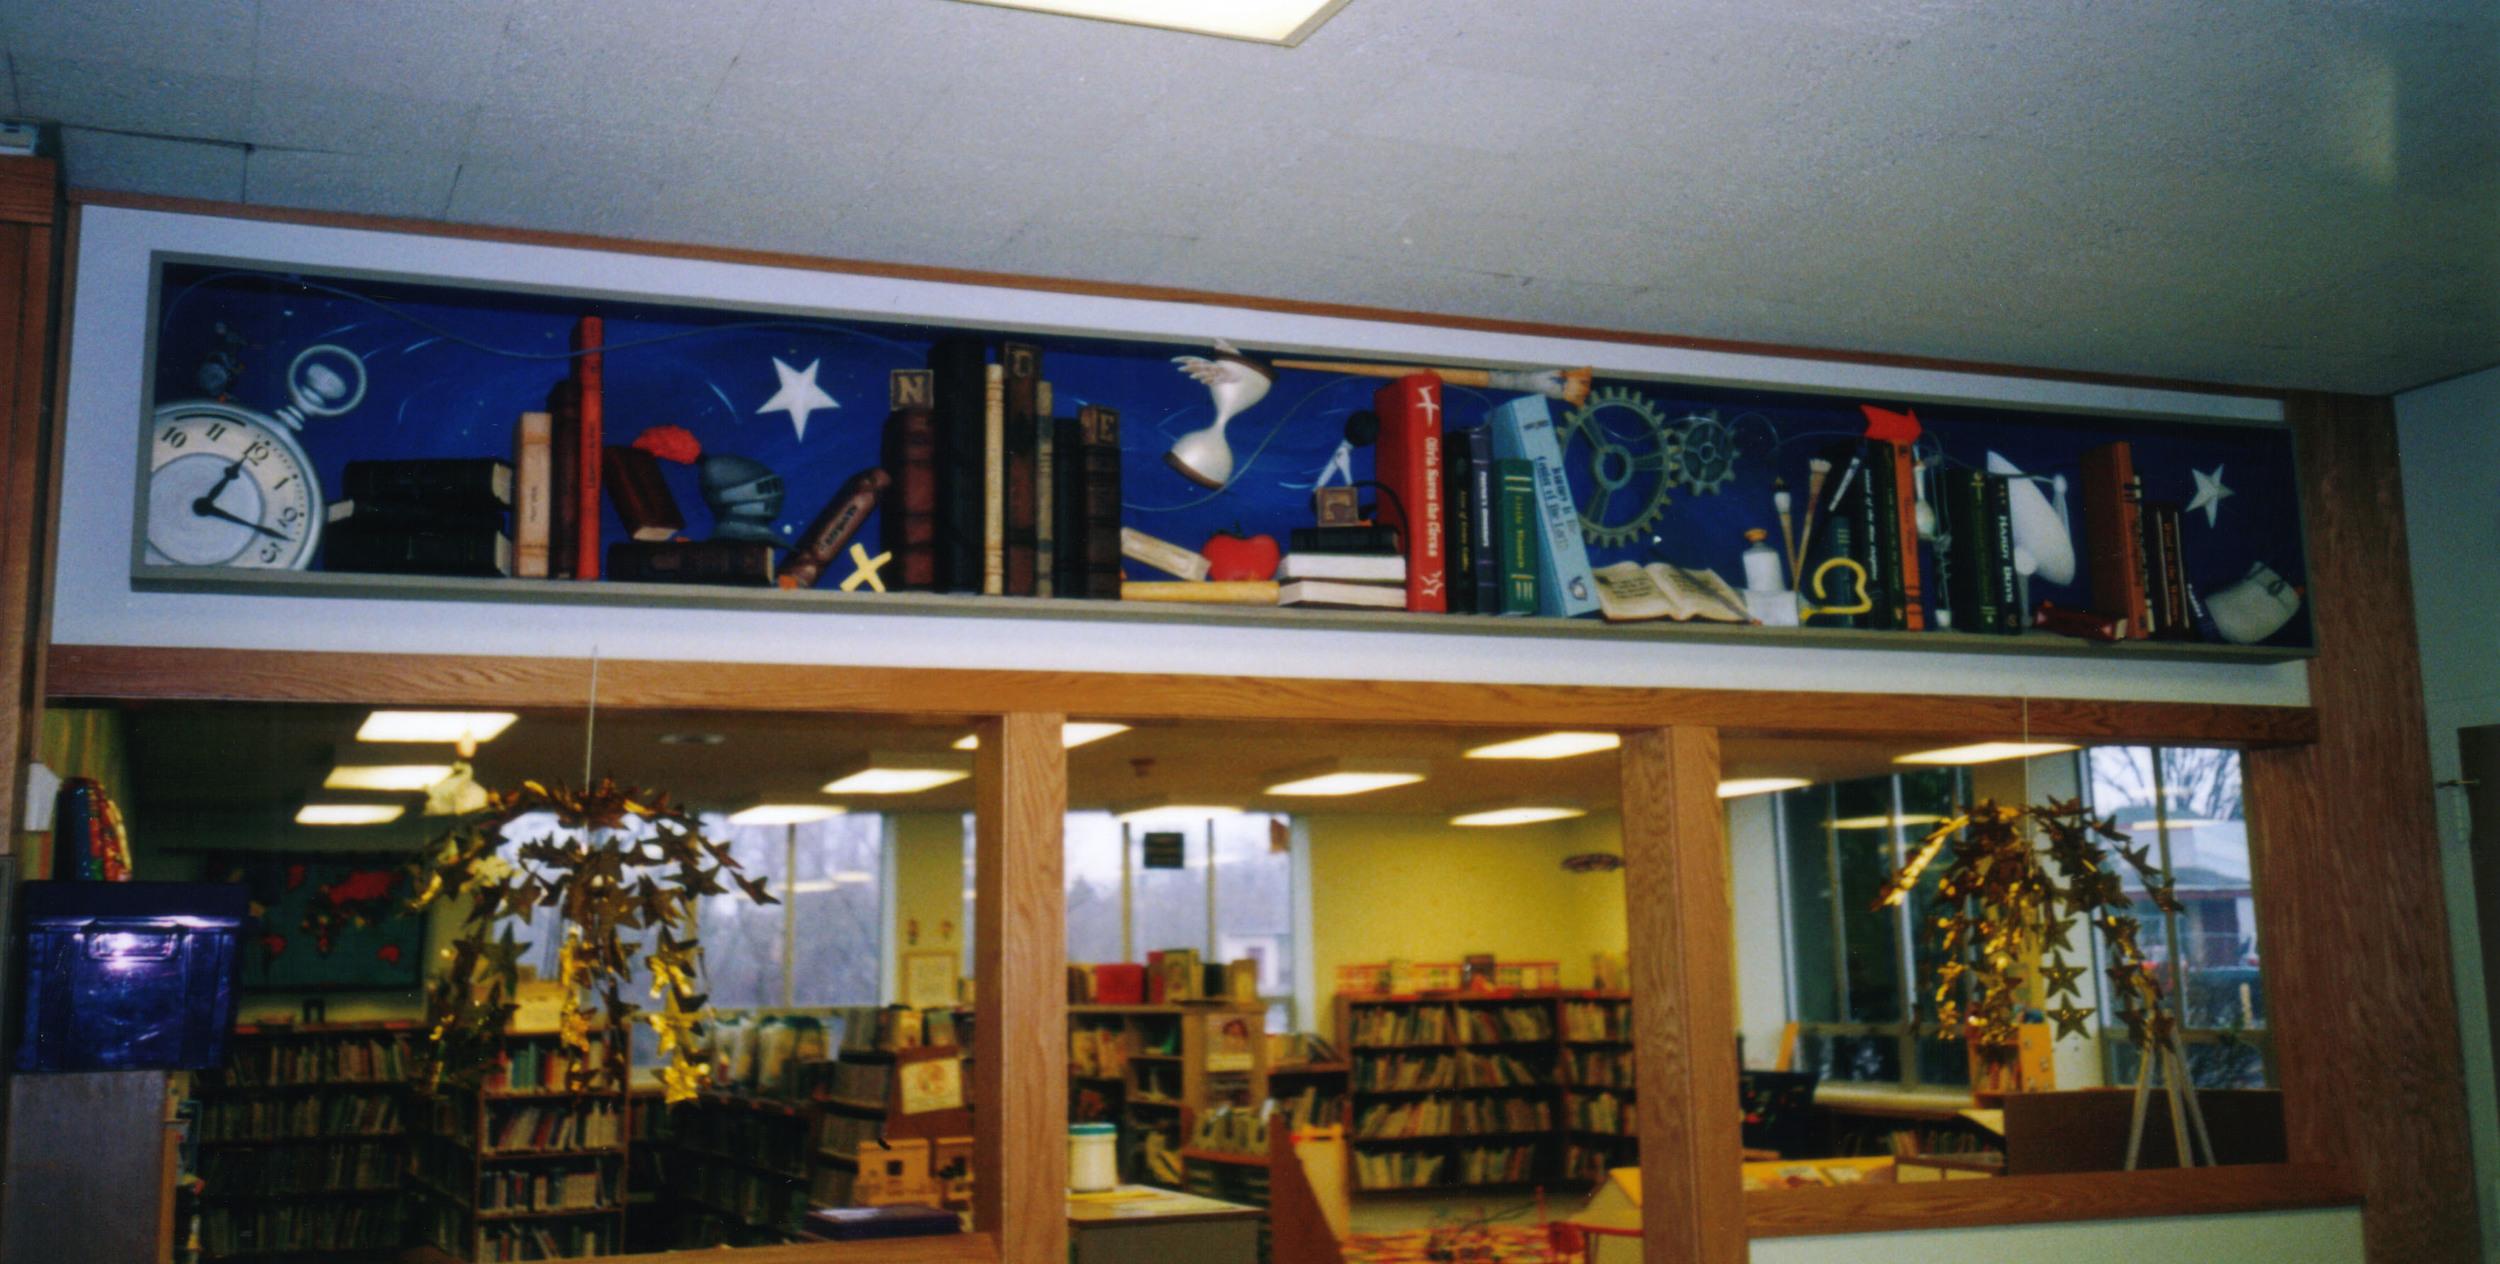 massena shelf-1.jpg